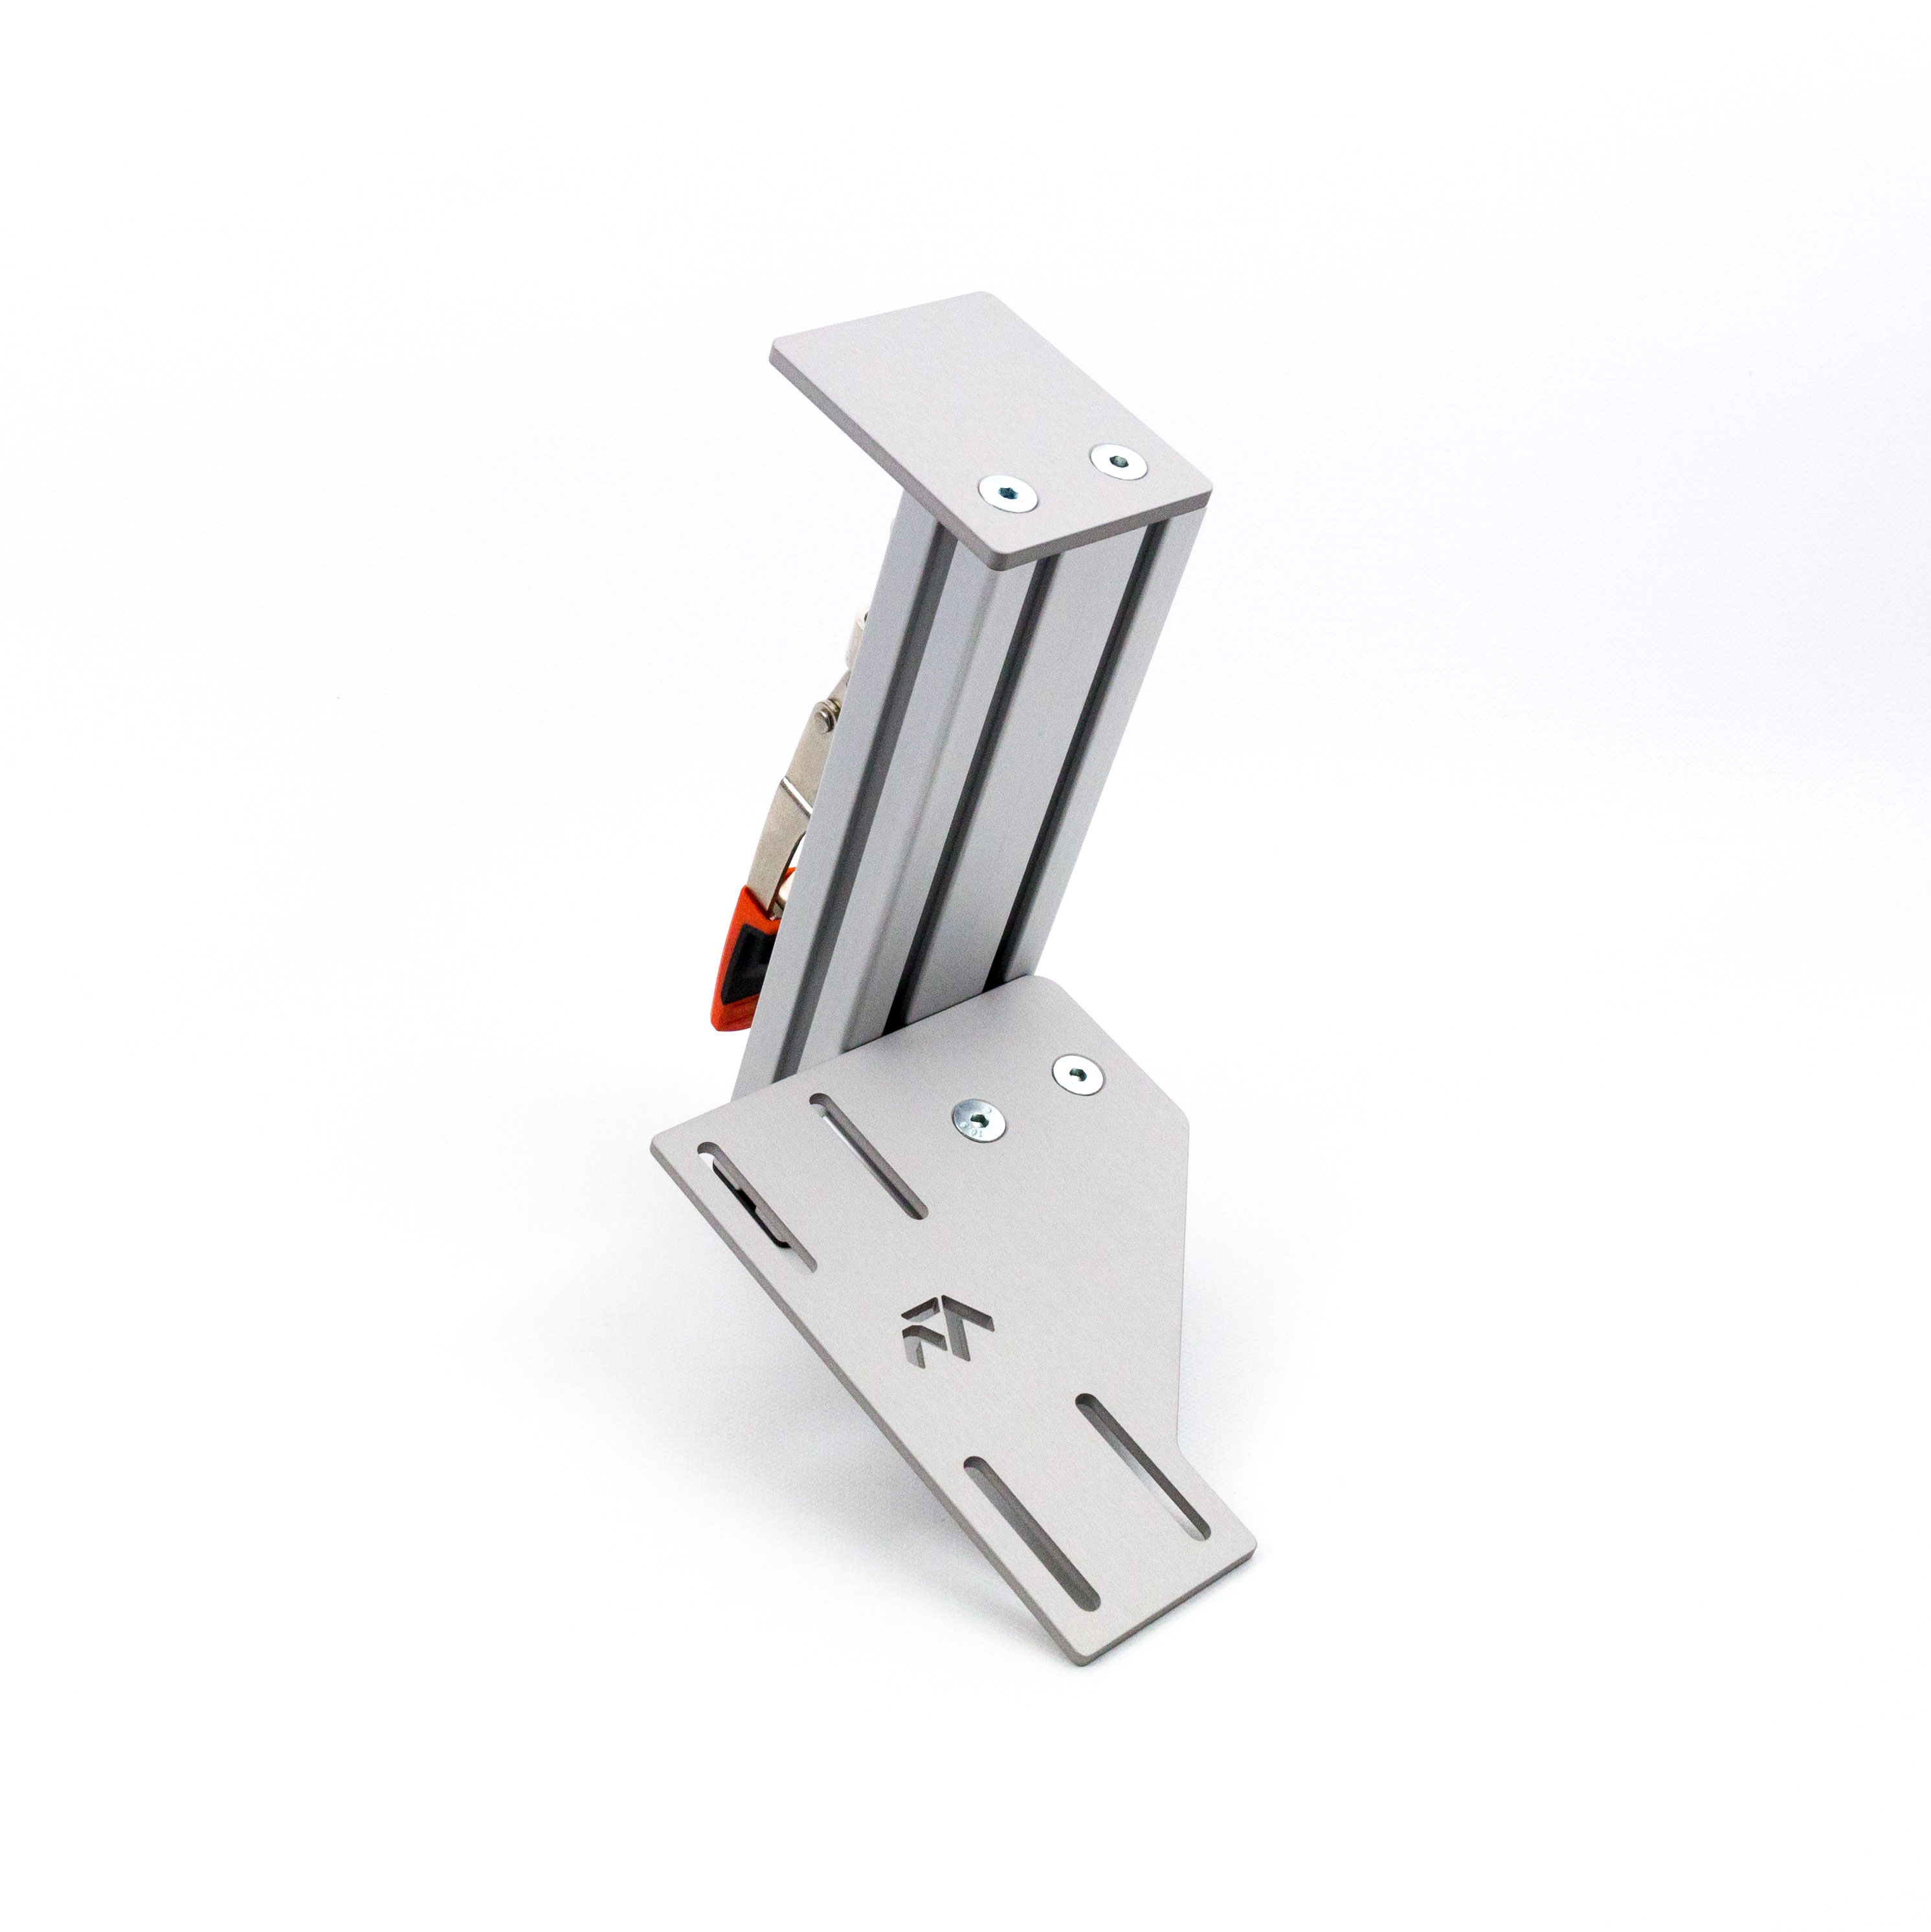 Shifter / Handbrake Table Mount